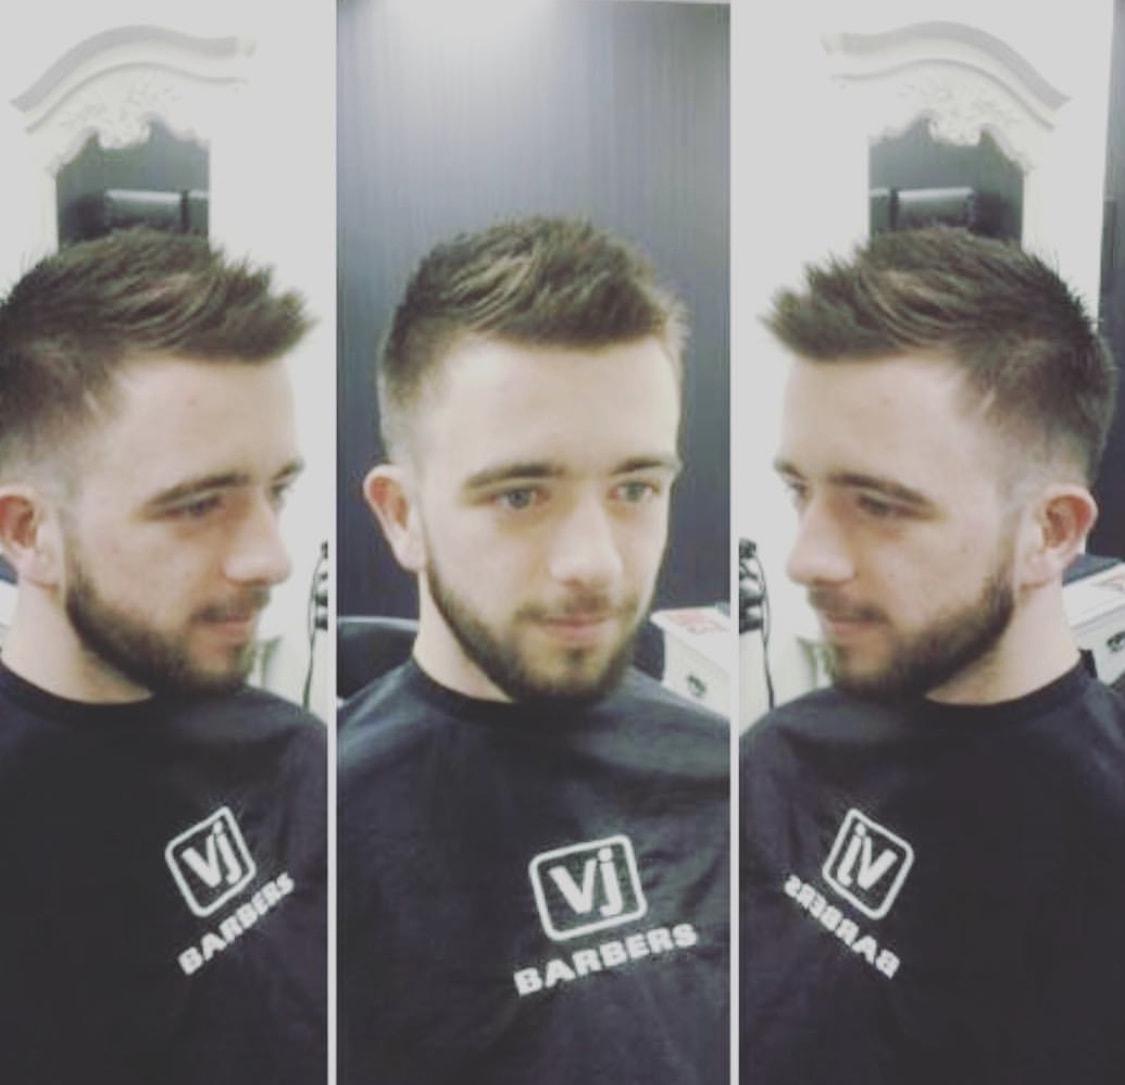 VJ barbers styling